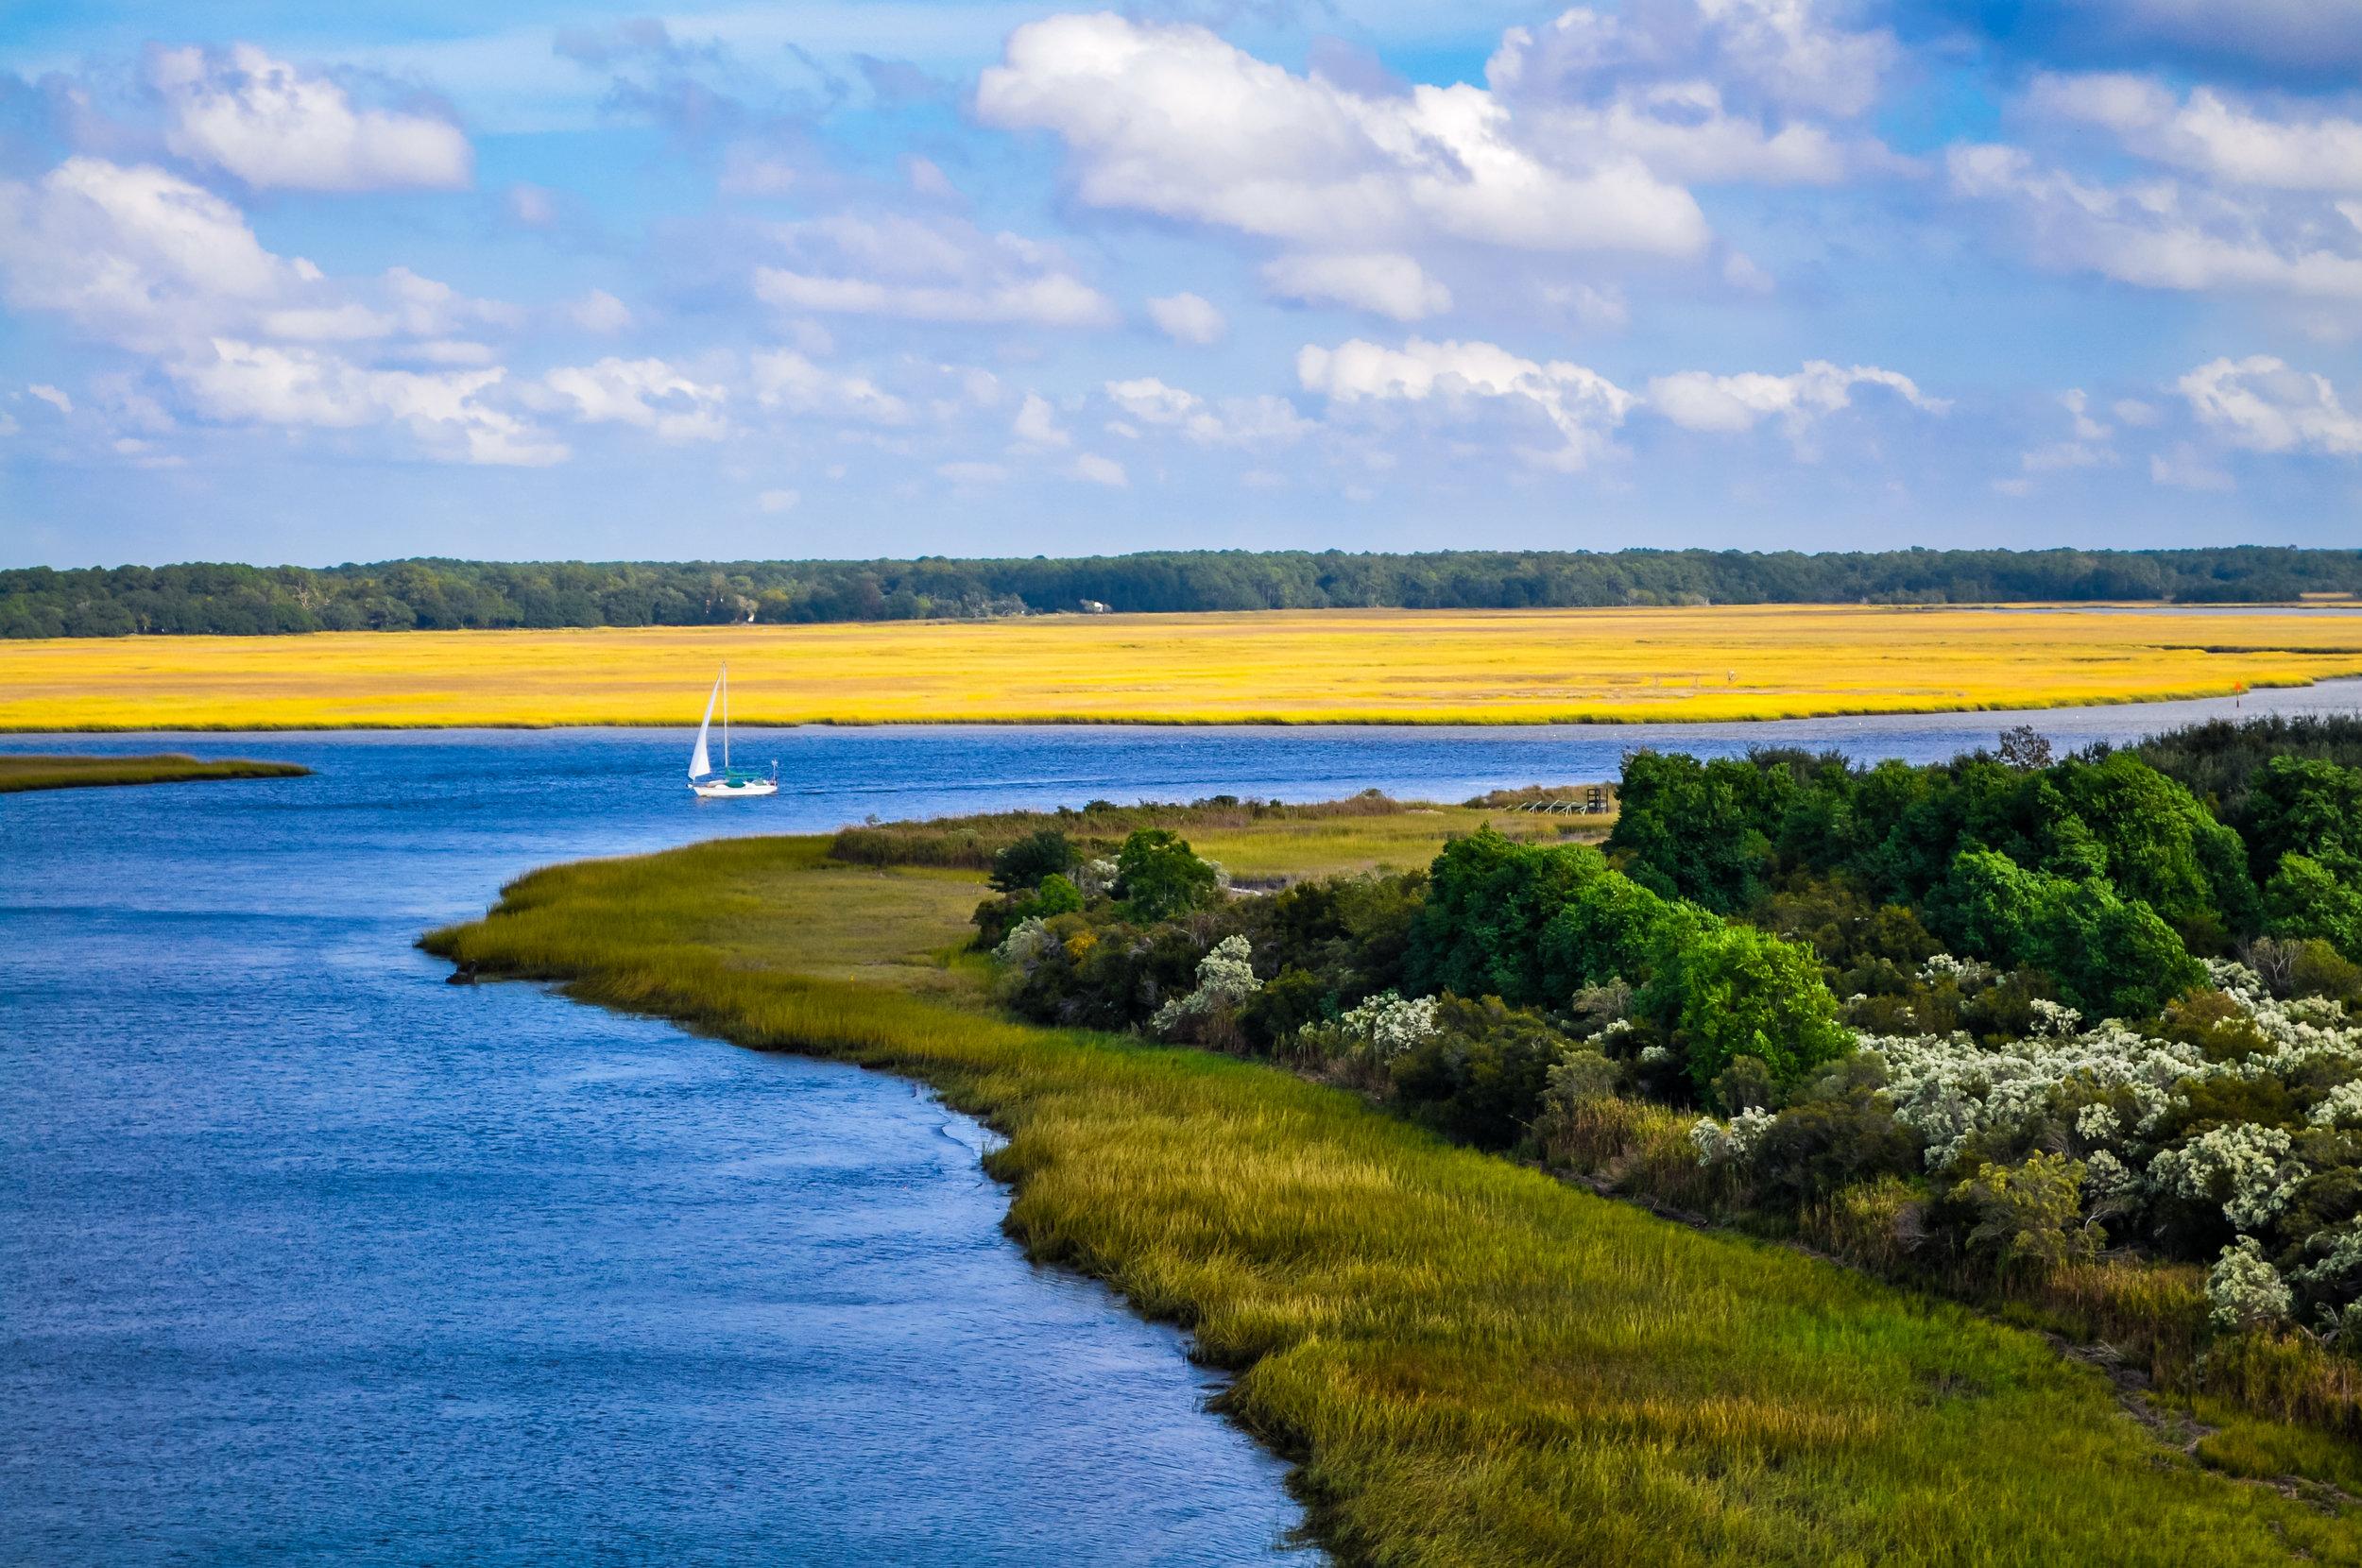 Colorful view of sailboat in creek at Edisto Island, SC.